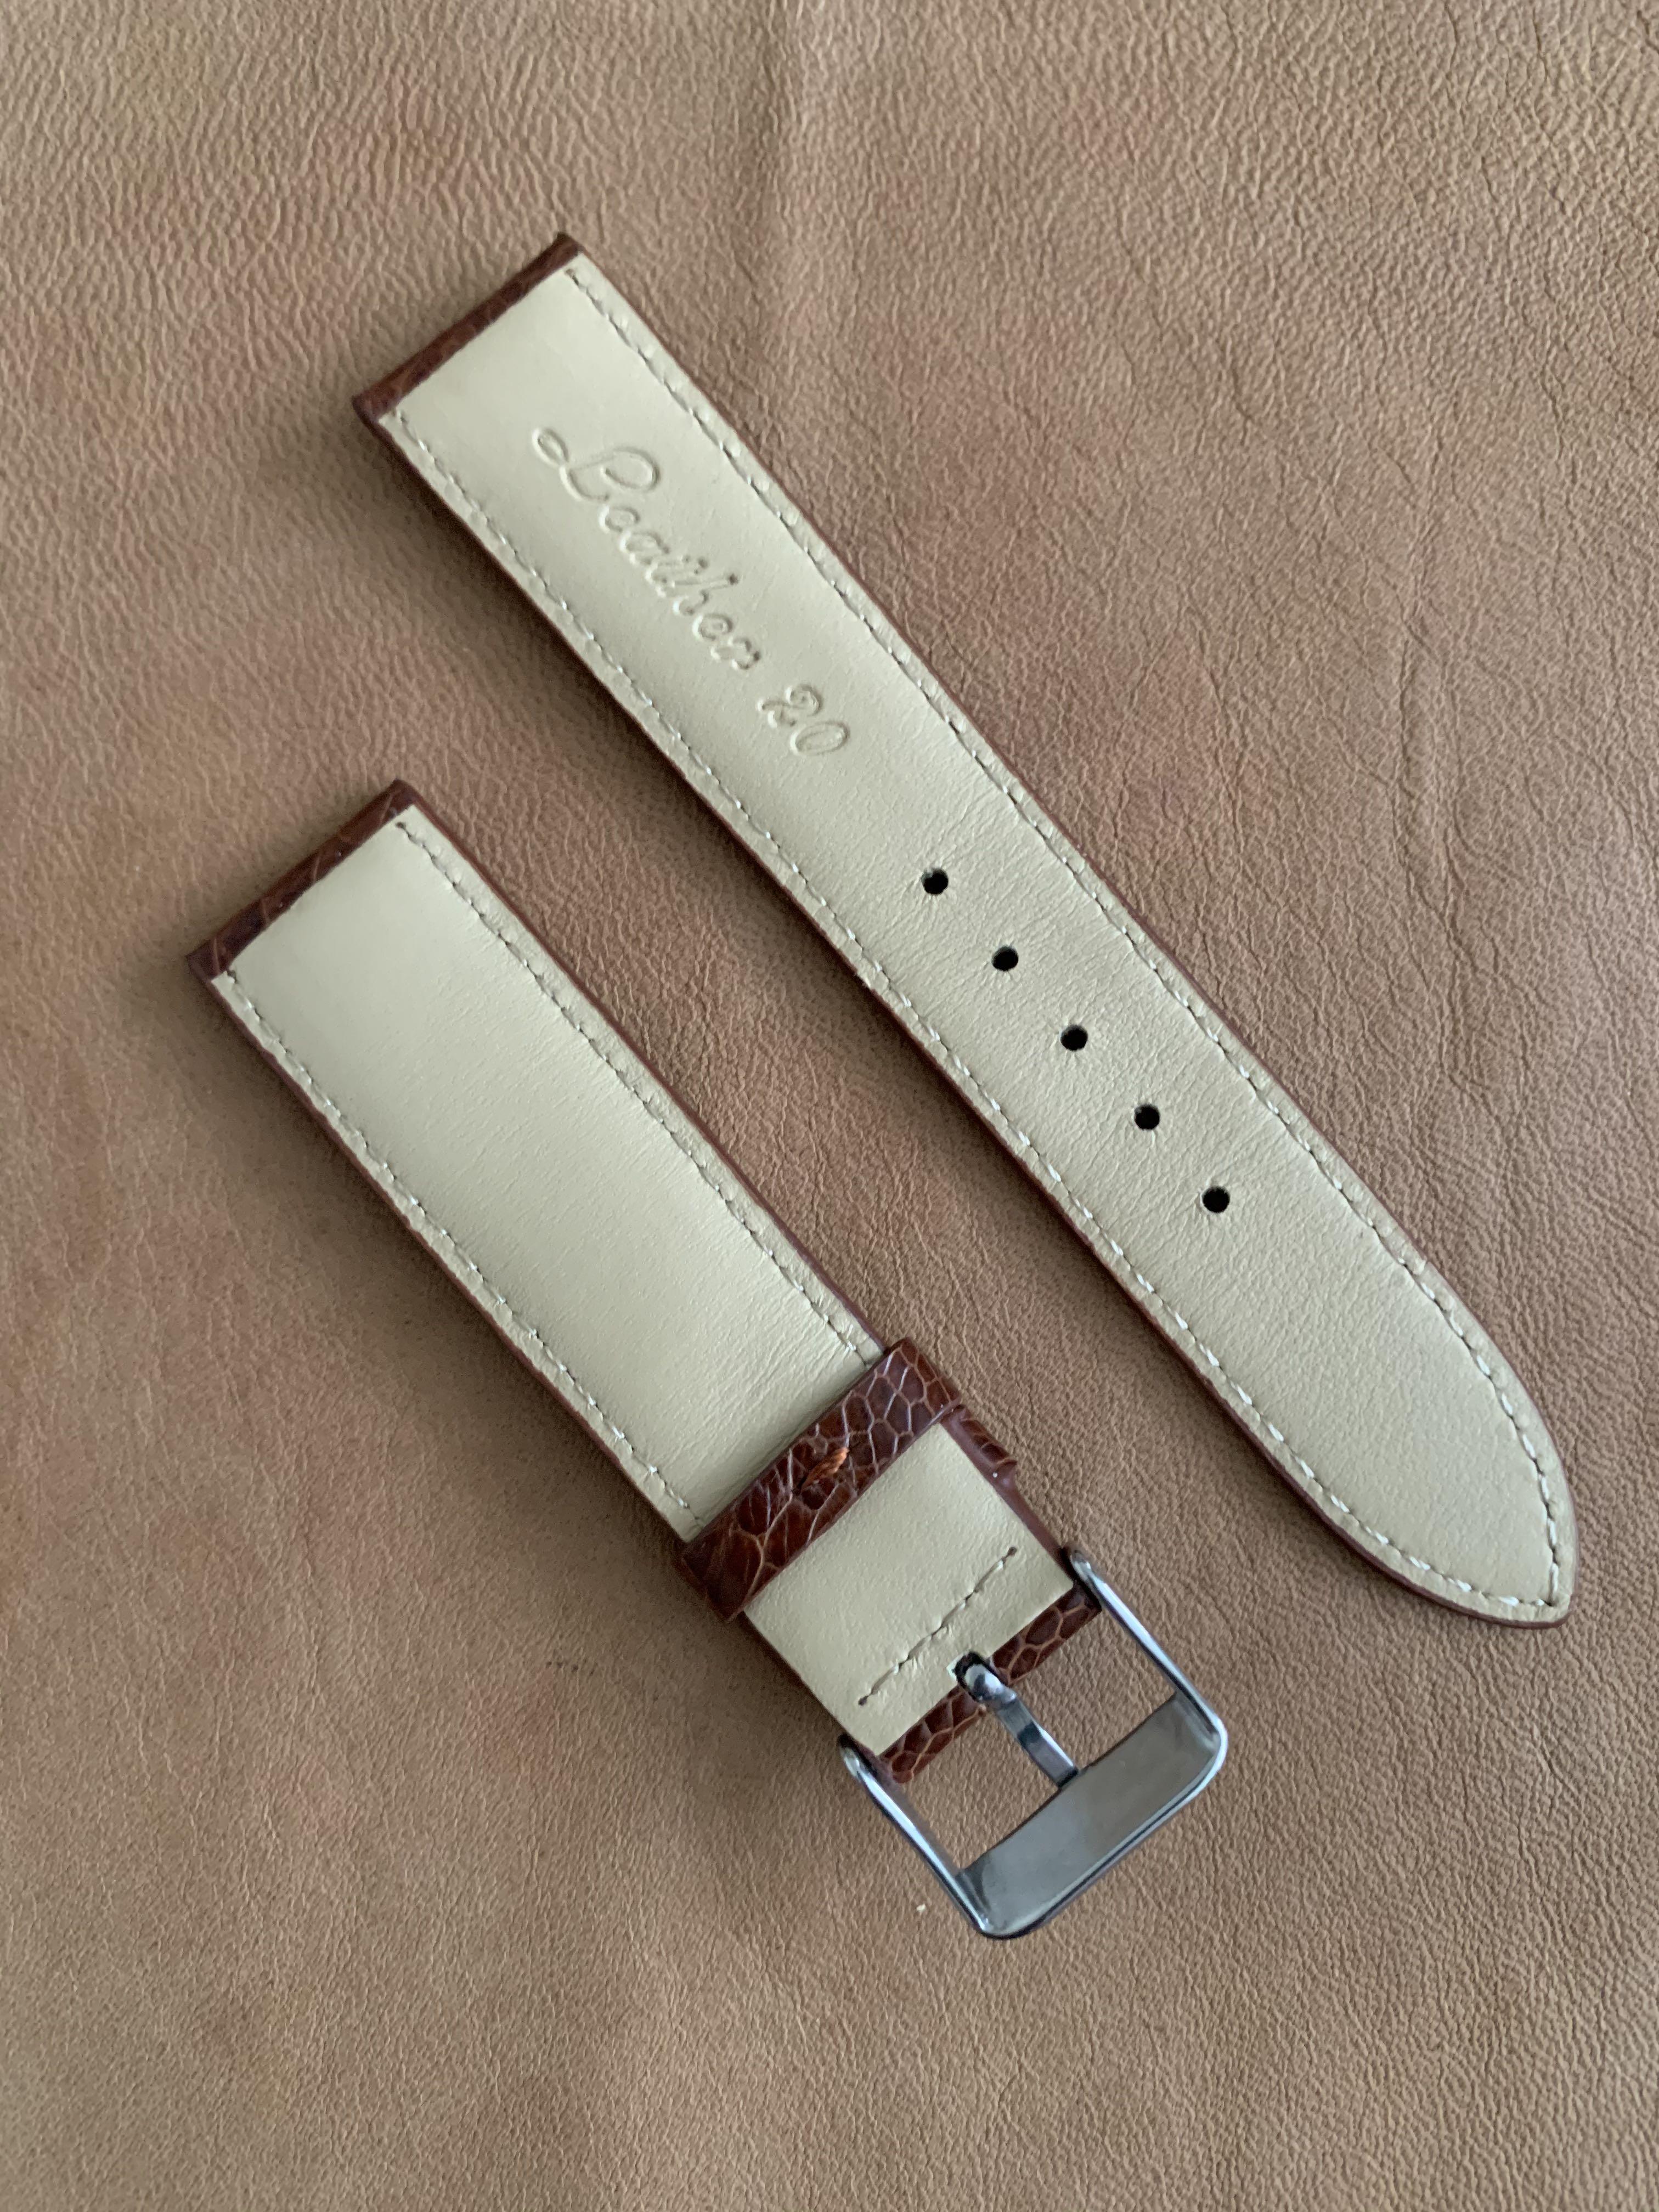 20mm/18mm Dark Whiskey Brown Ostrich Leg Watch Strap (with stitching) - 20mm@lug/18mm@buckle  20mm/18mm     Standard length: L-120mm,S-75mm